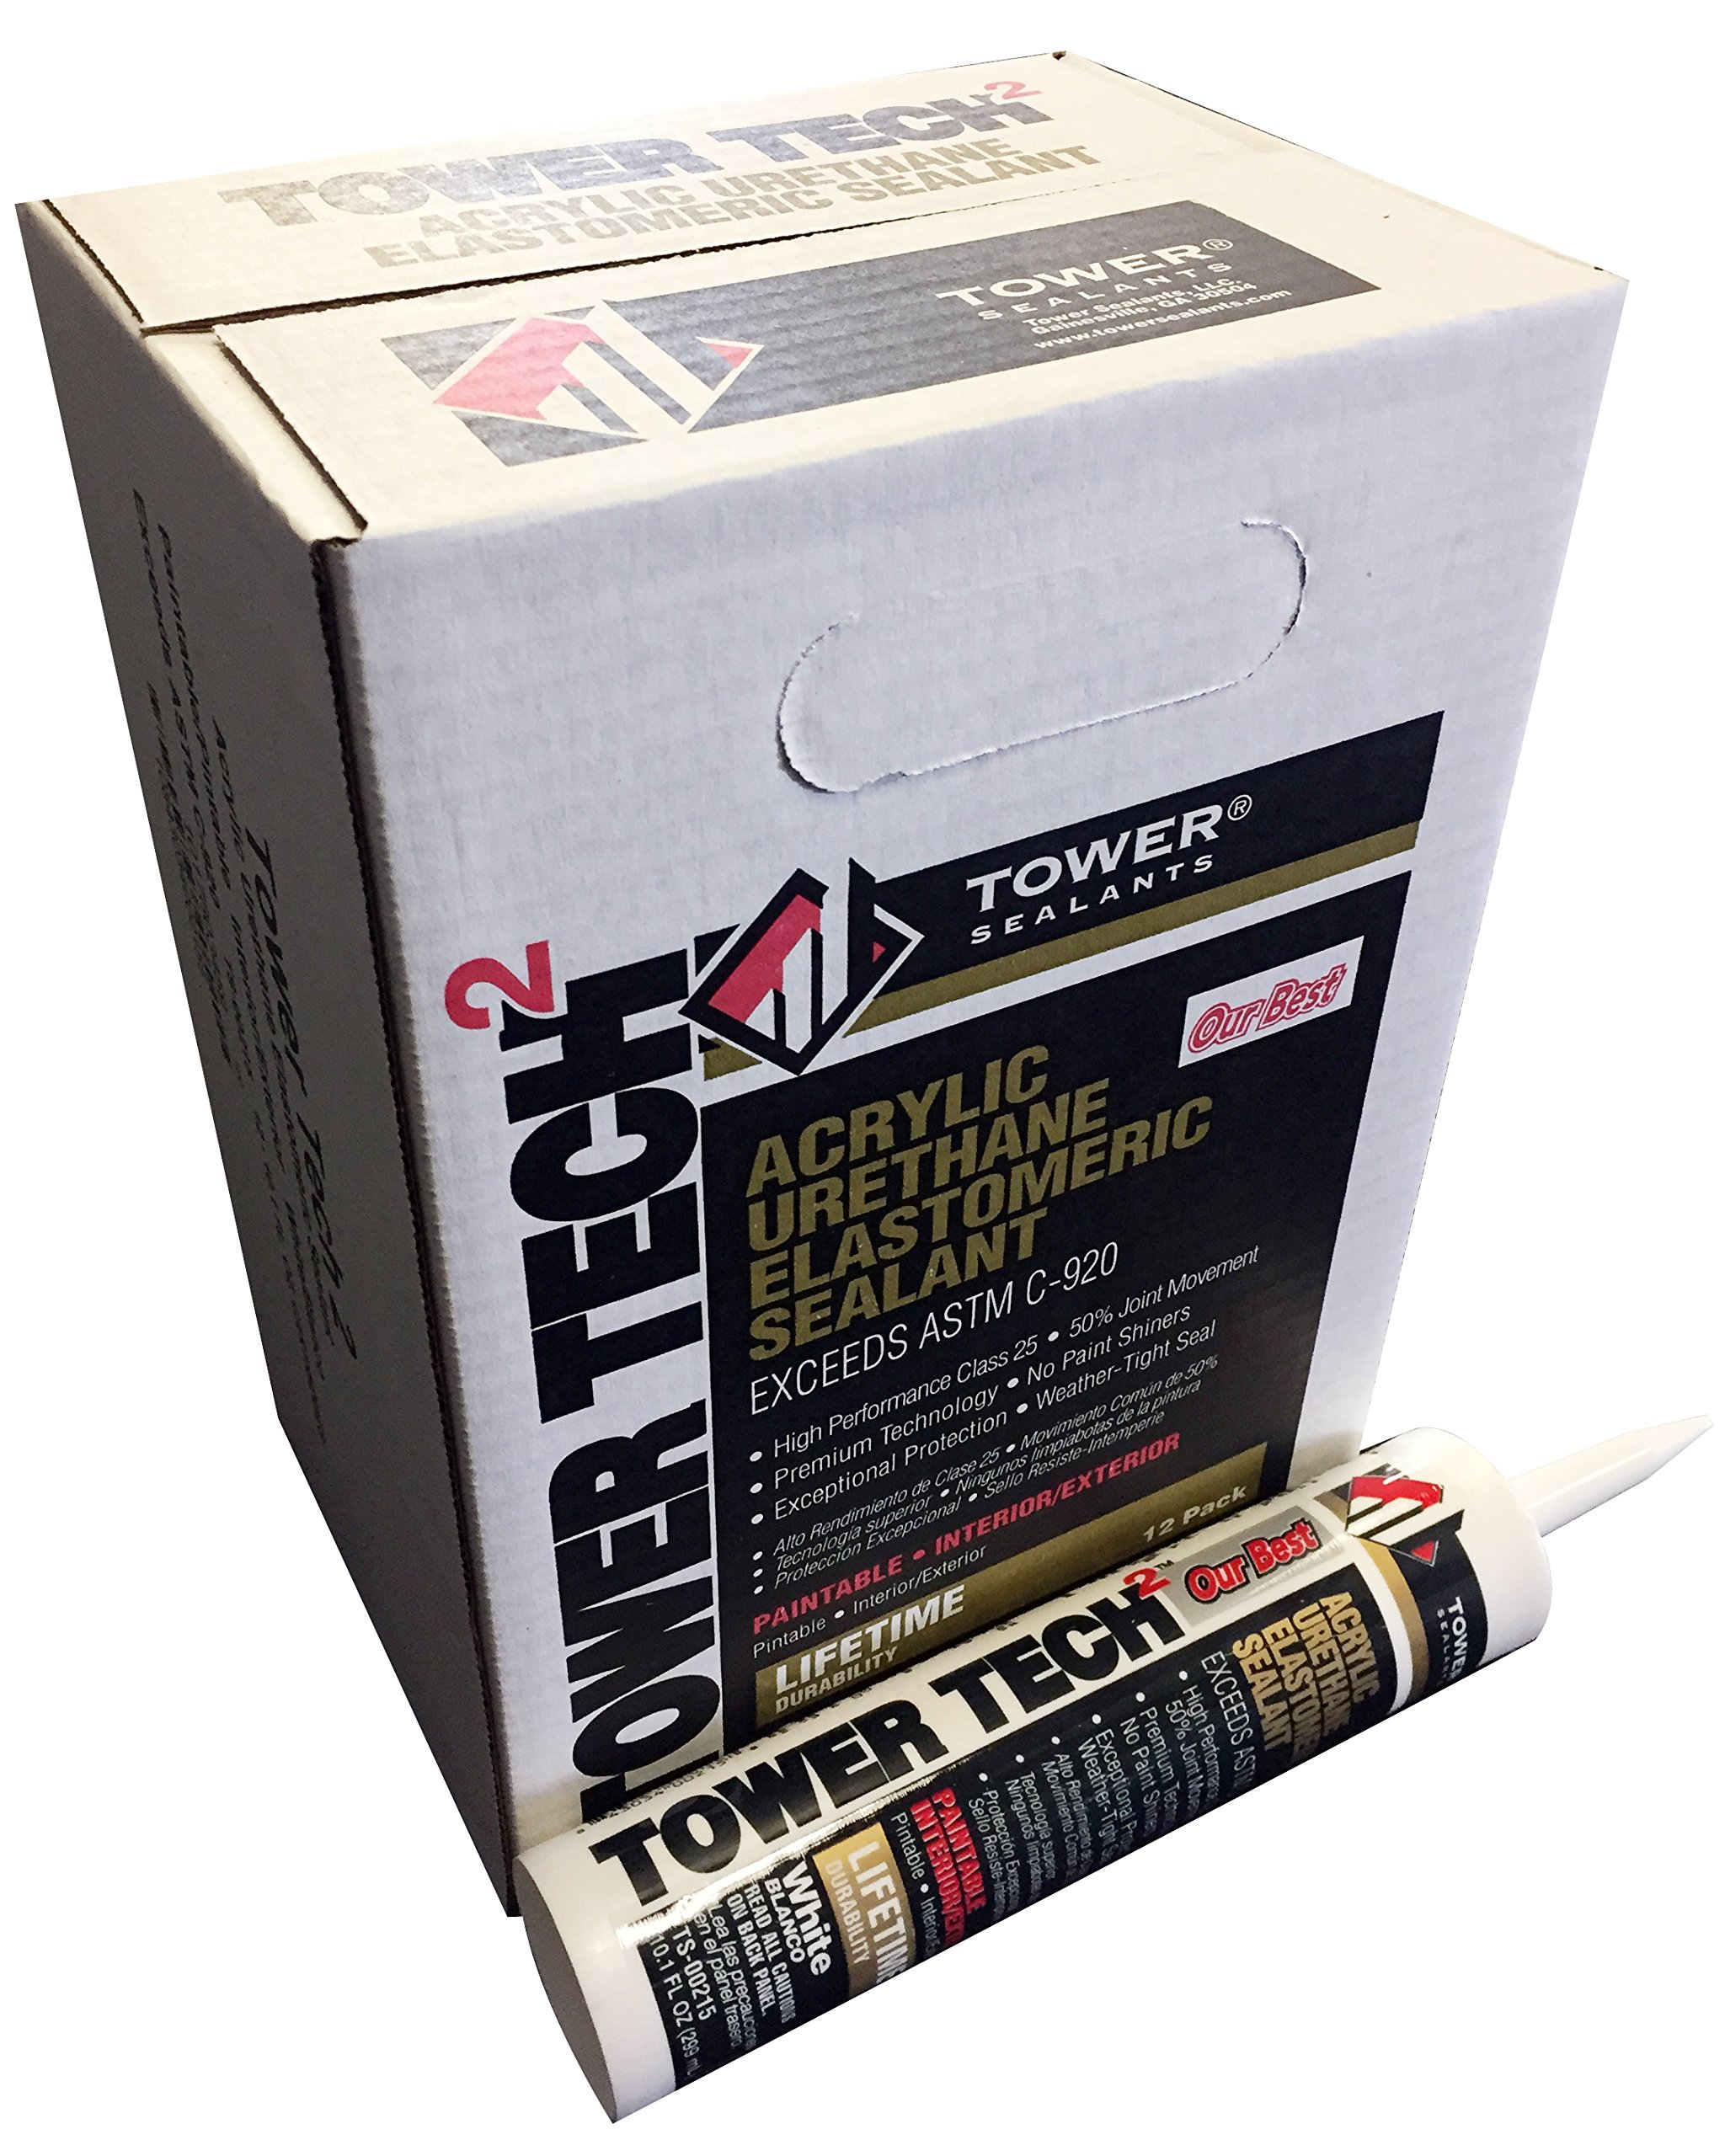 Tower Sealants TS-00215 10.1 fl-Ounce Tower Tech 2 Acrylic Urethane Sealant, White - Pack of 12